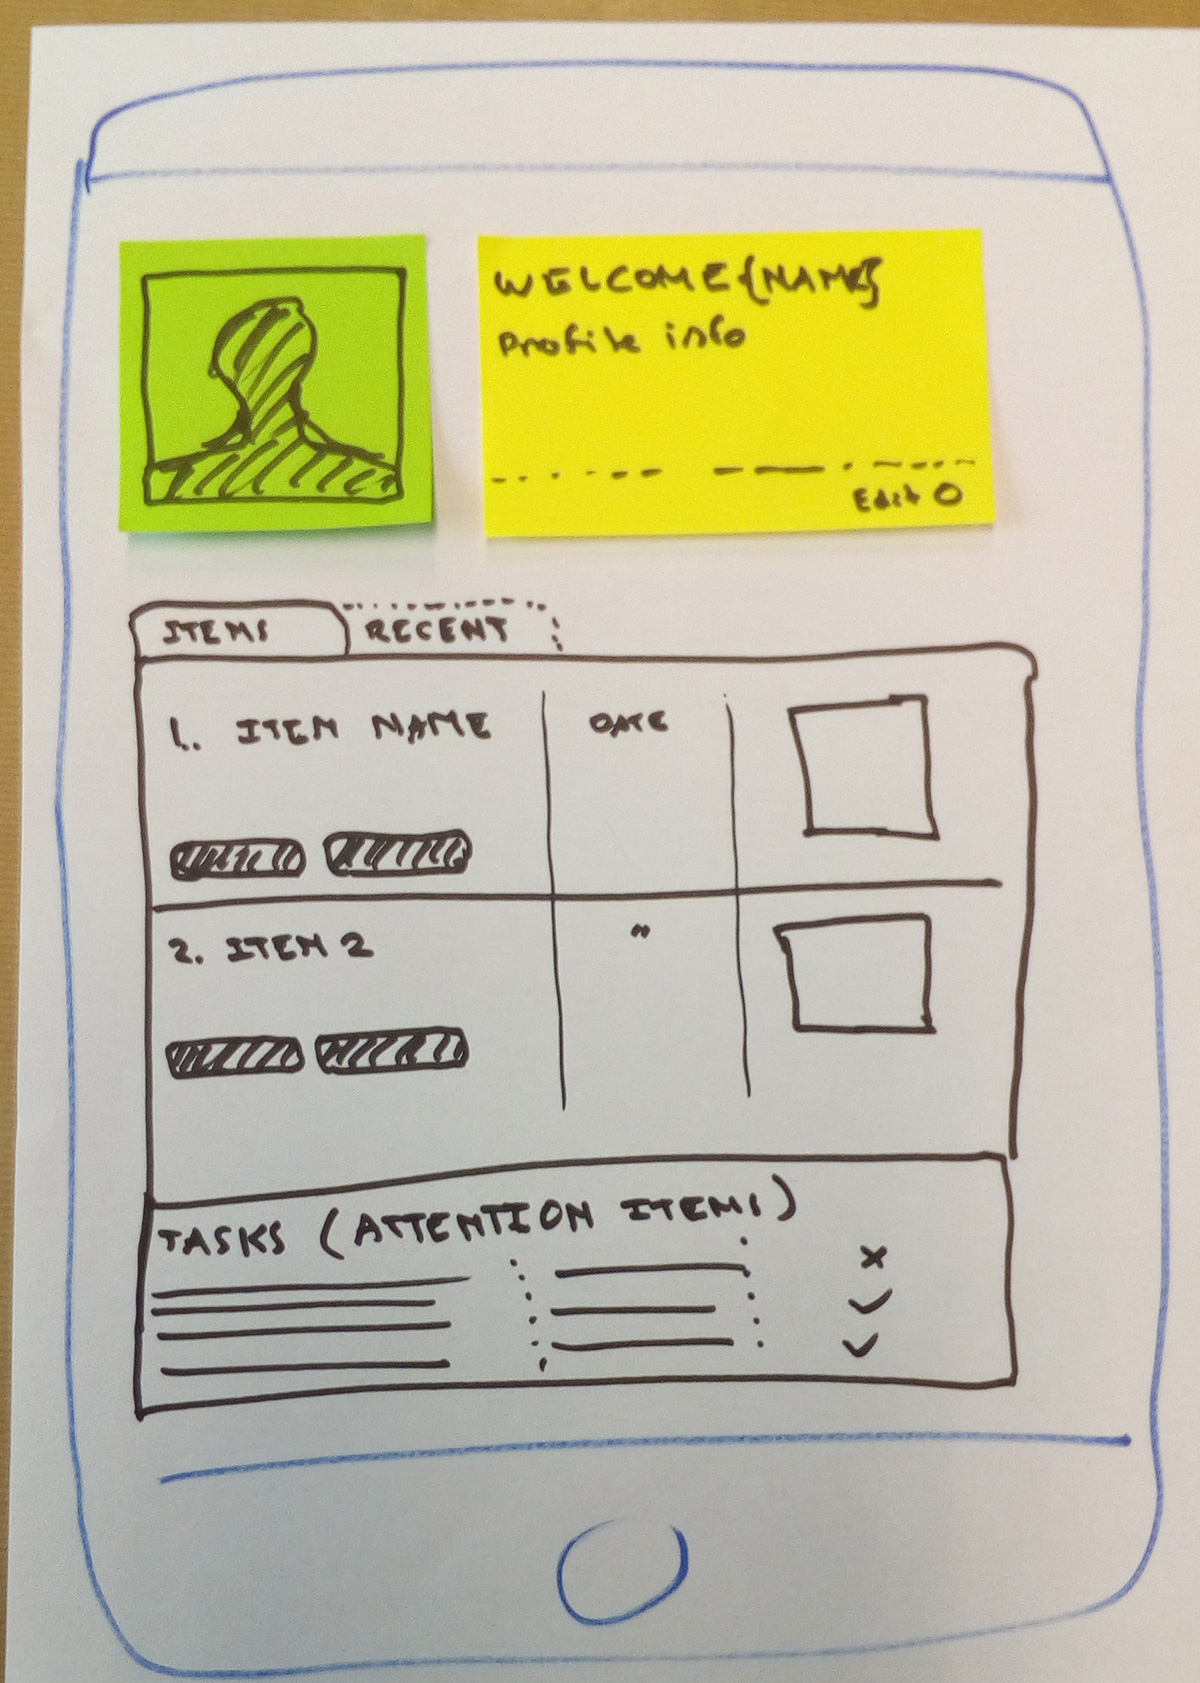 Rapid Prototyping Design Sprint axure clickable demo